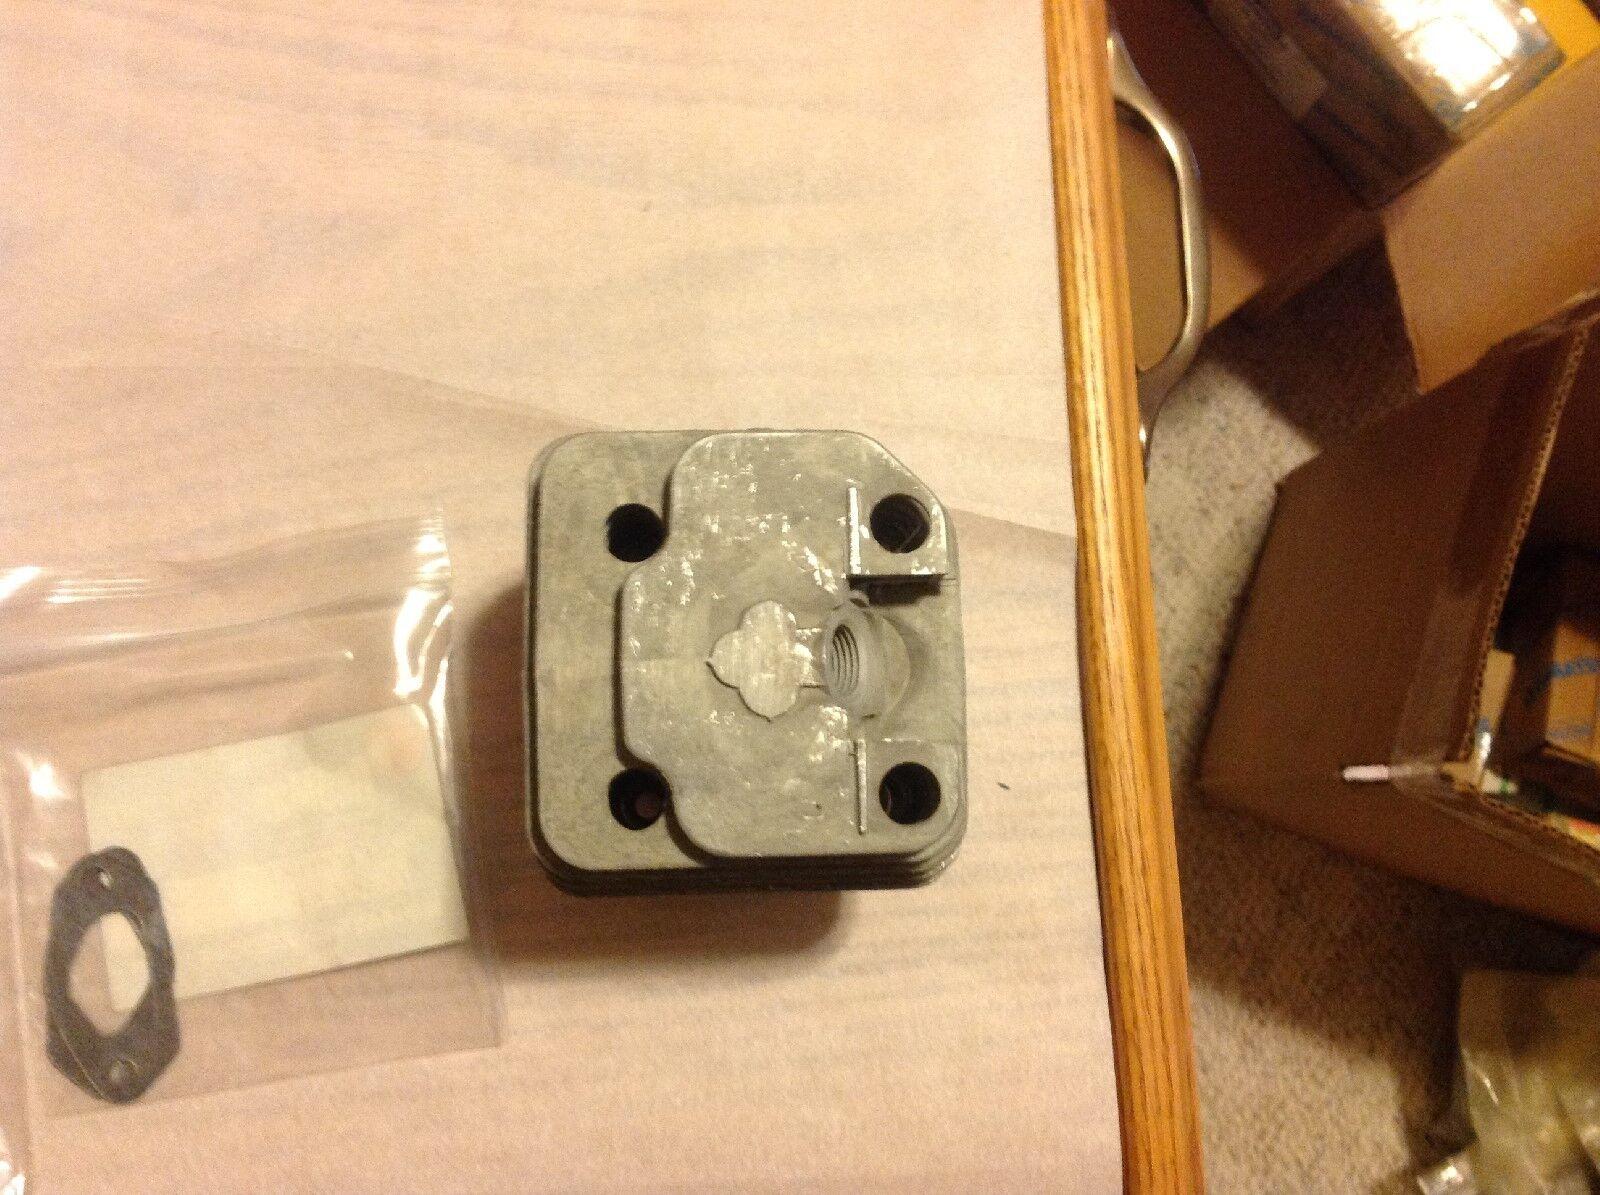 Kit De Cilindro Ajuste ZENOAH-KOMATSU G4500, G455 G 4500, G 455 AVS (43mm) 2670-12113